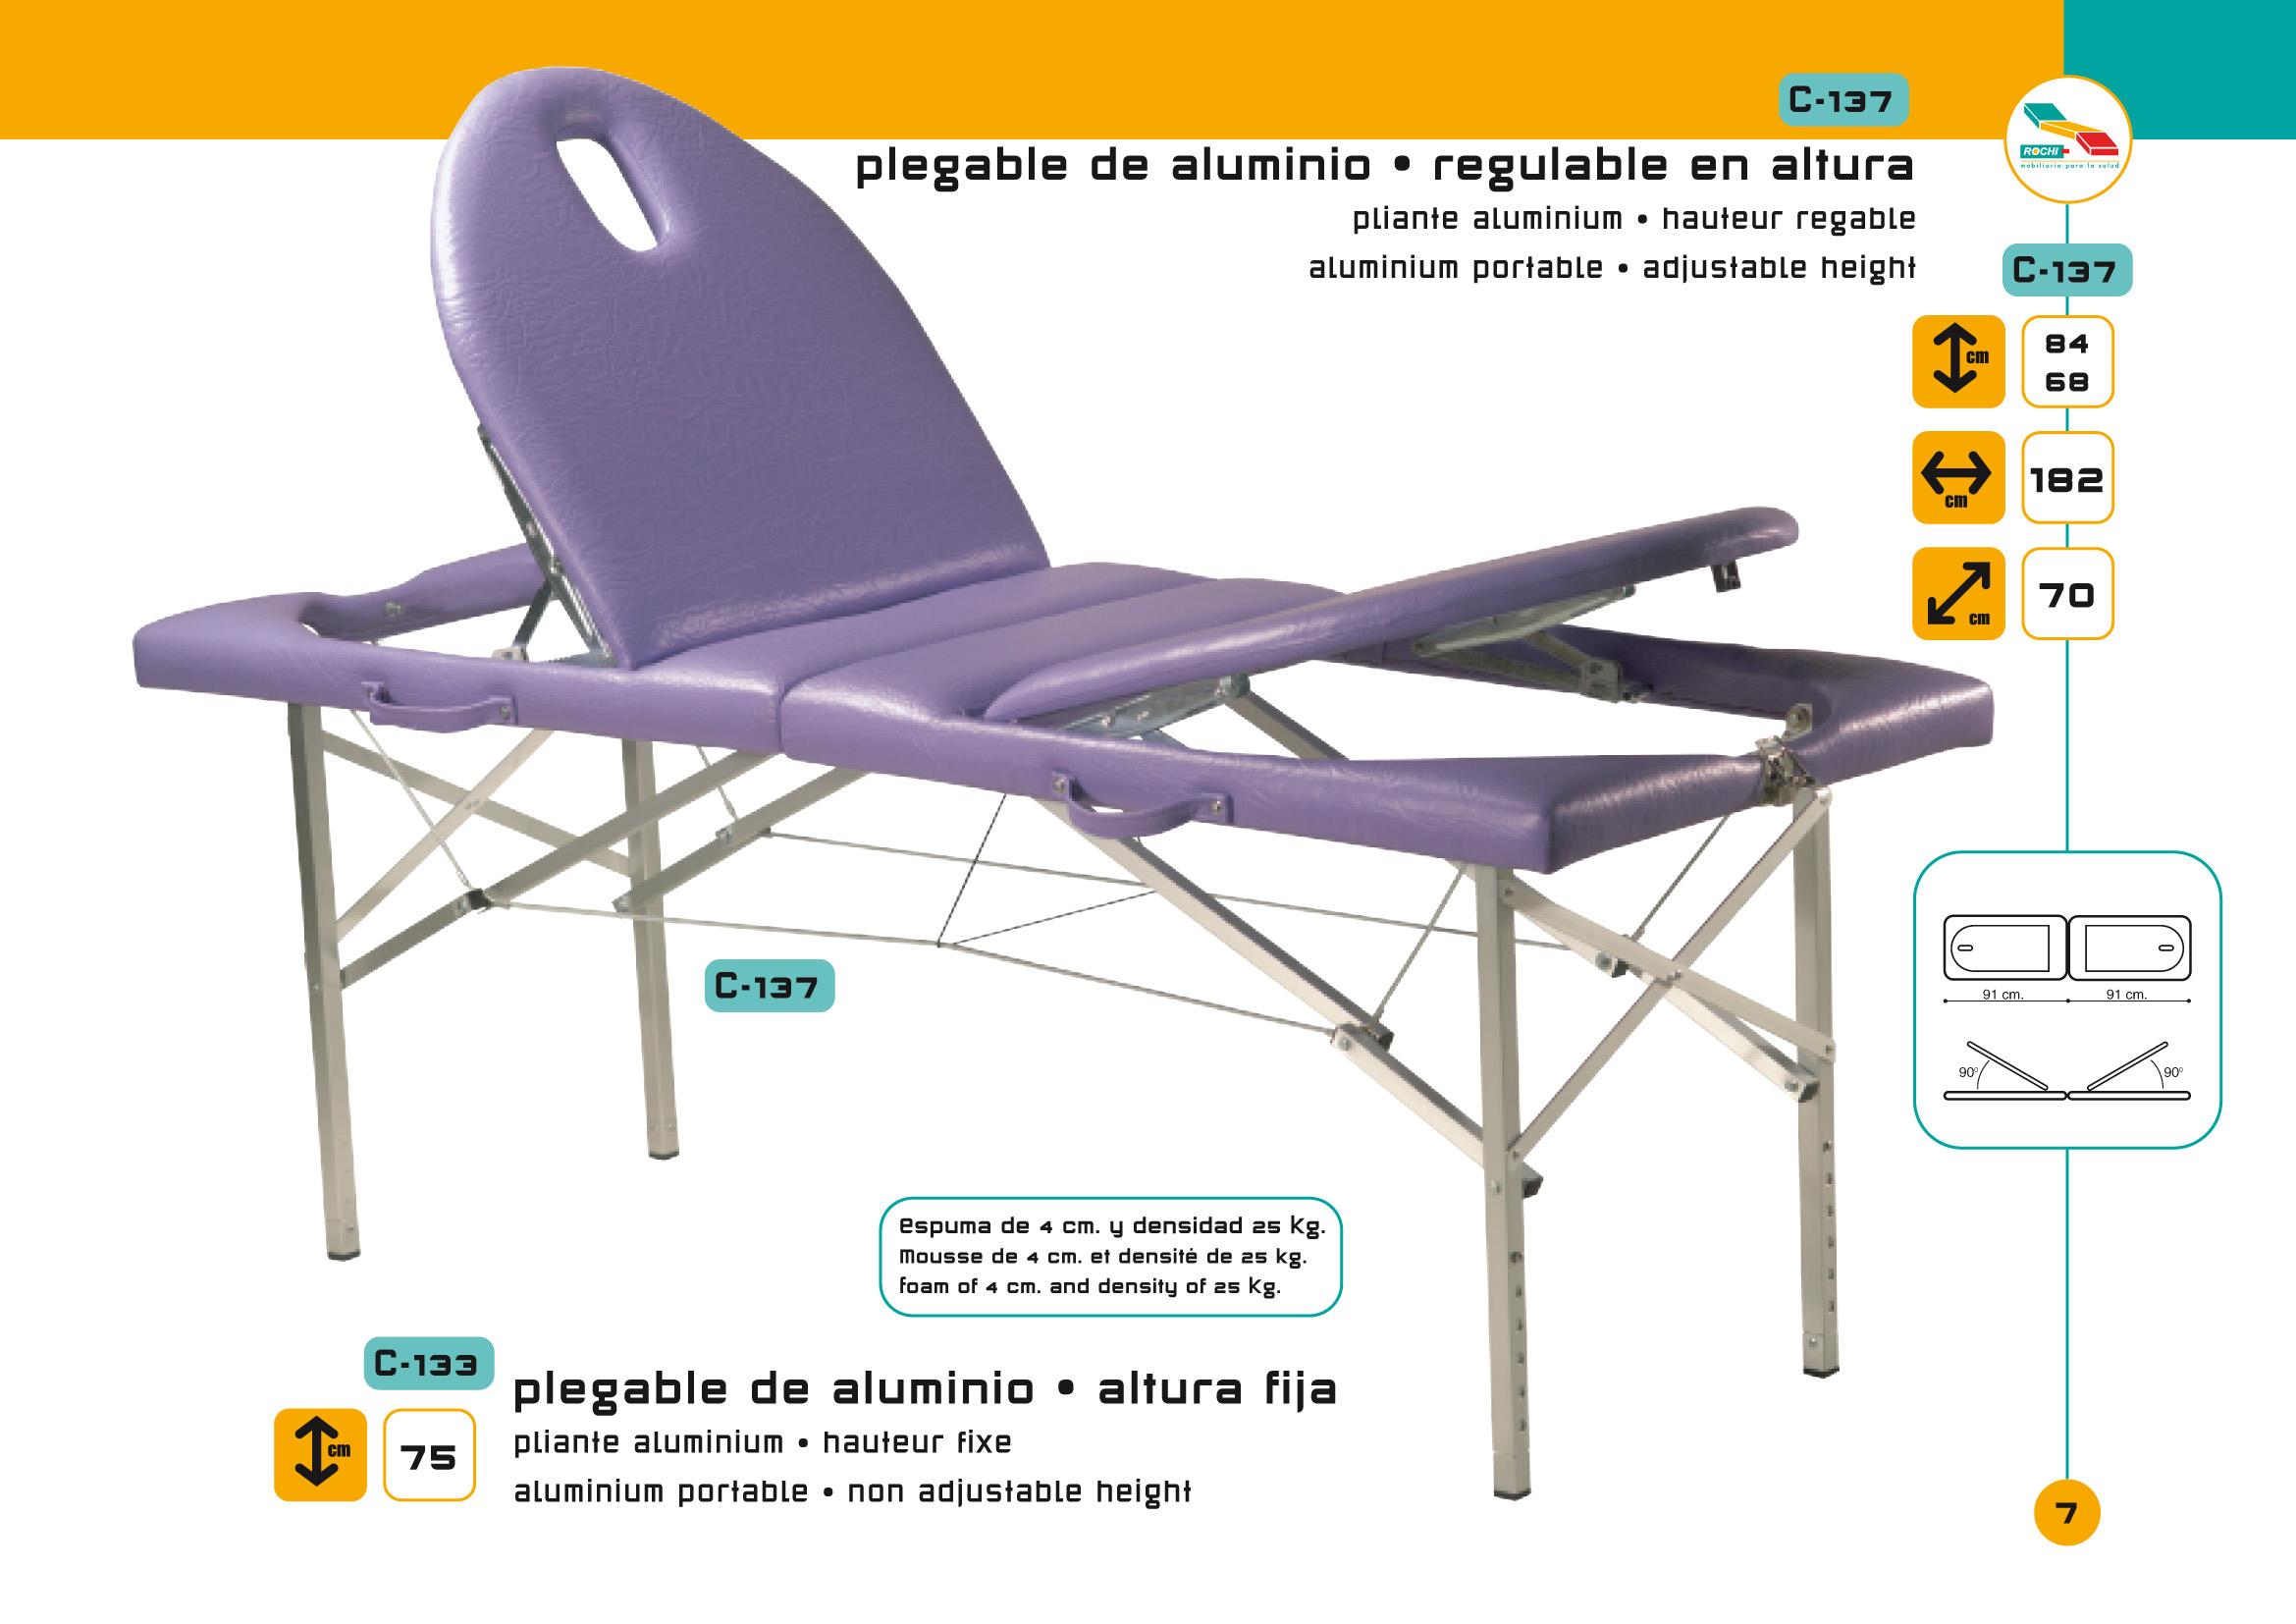 Table de massage pliante c 137 pi tement aluminium avec tendeurs - Table de massage pliante alu ...